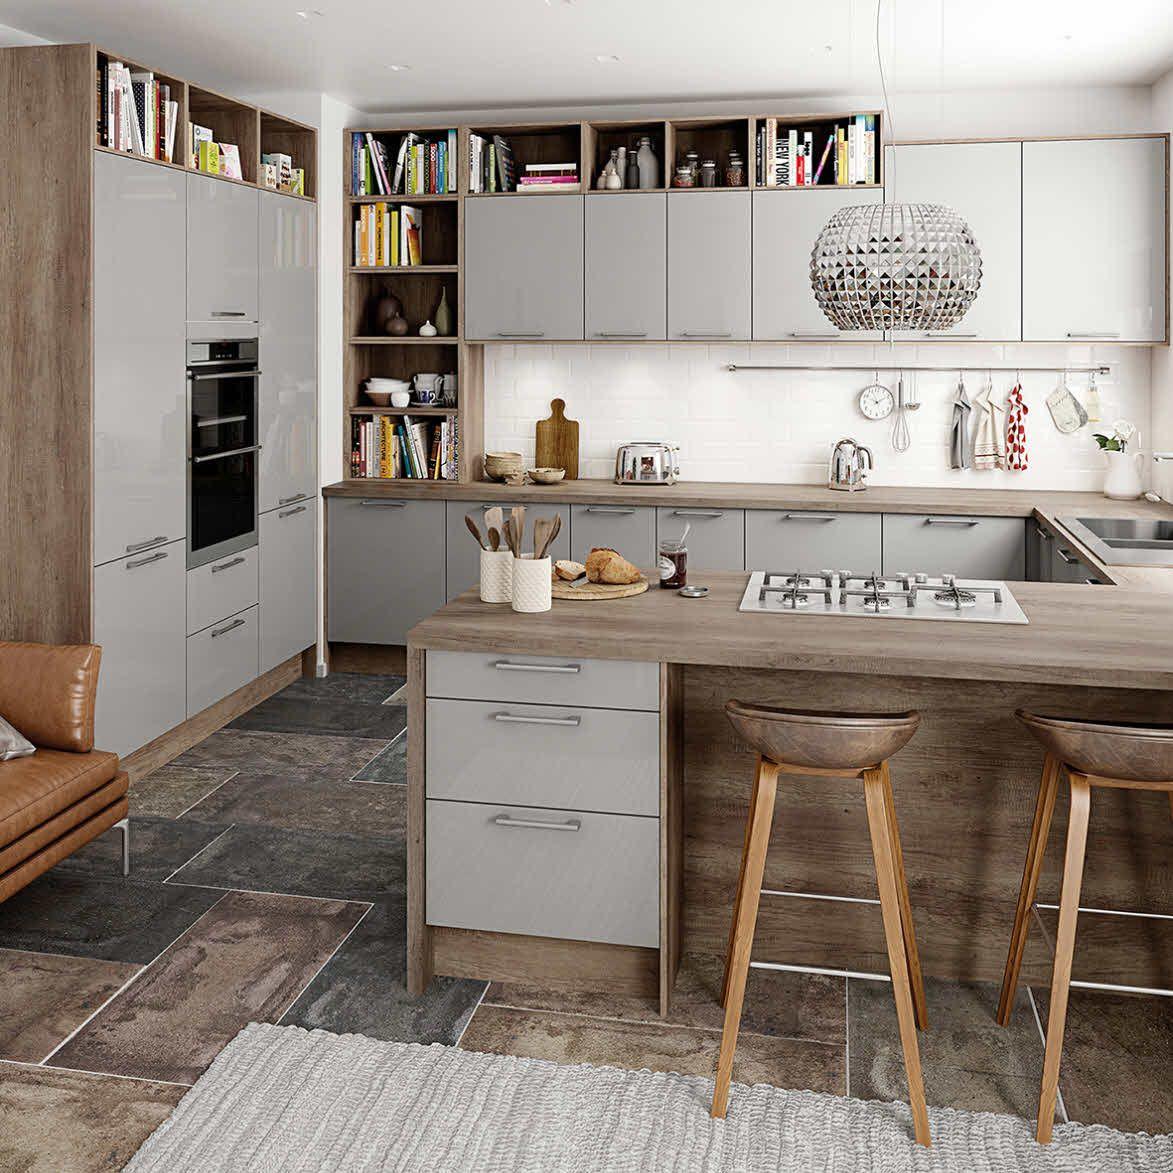 kitchens Google Search Kitchens Pinterest